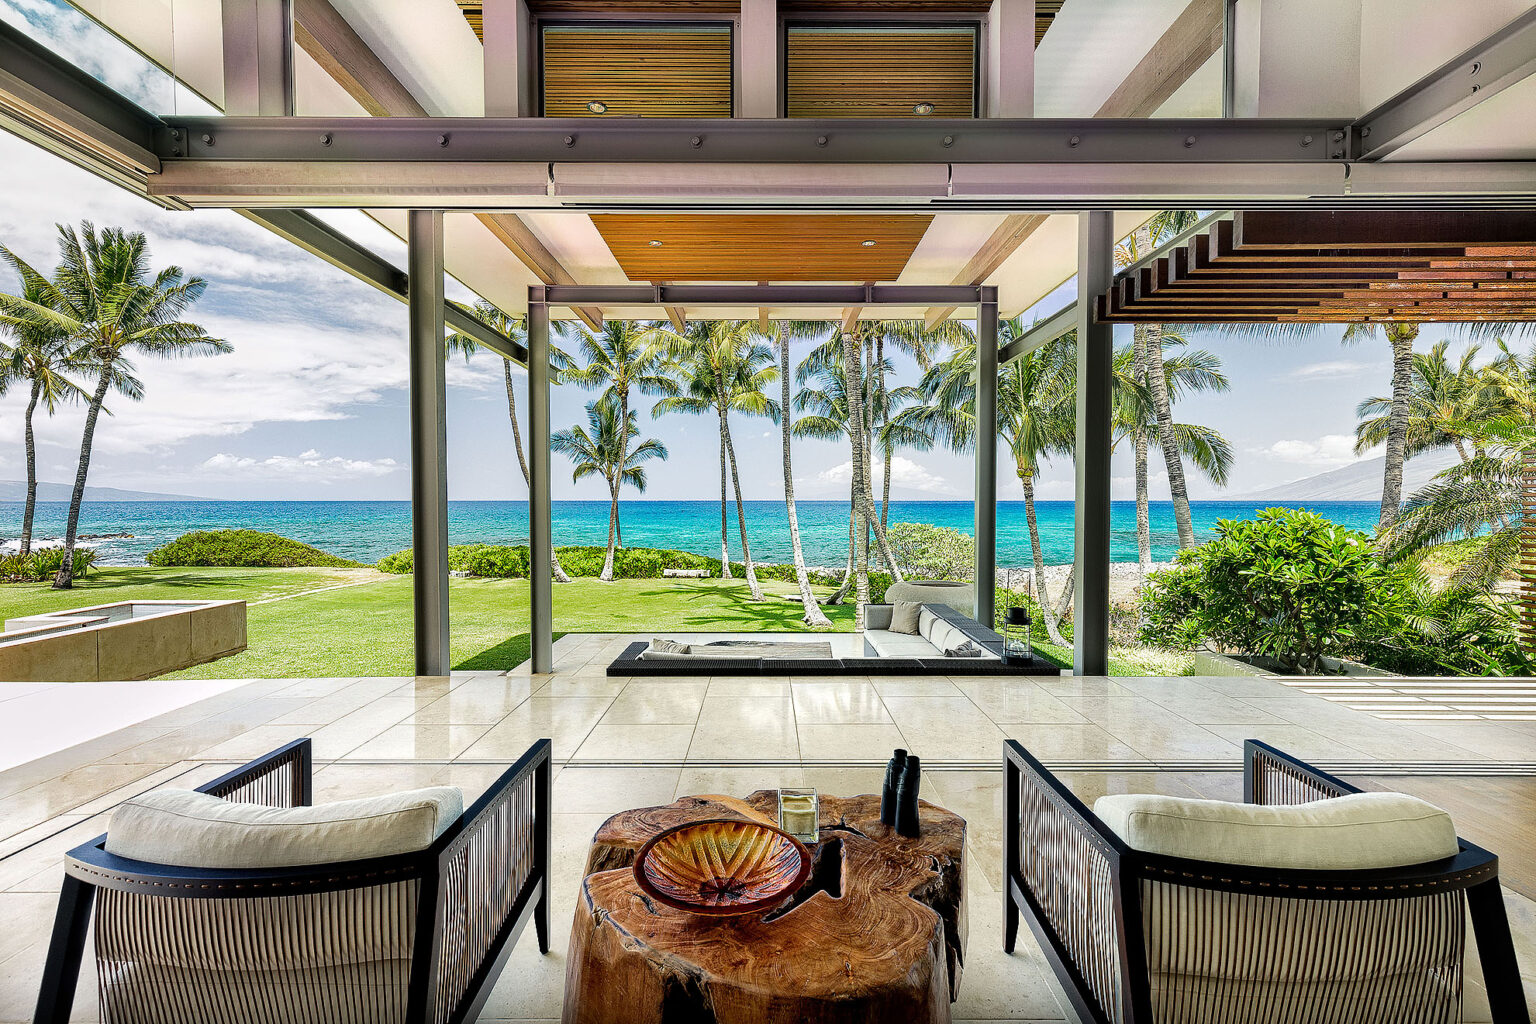 Maui Vacation Rental Photography by PanaViz